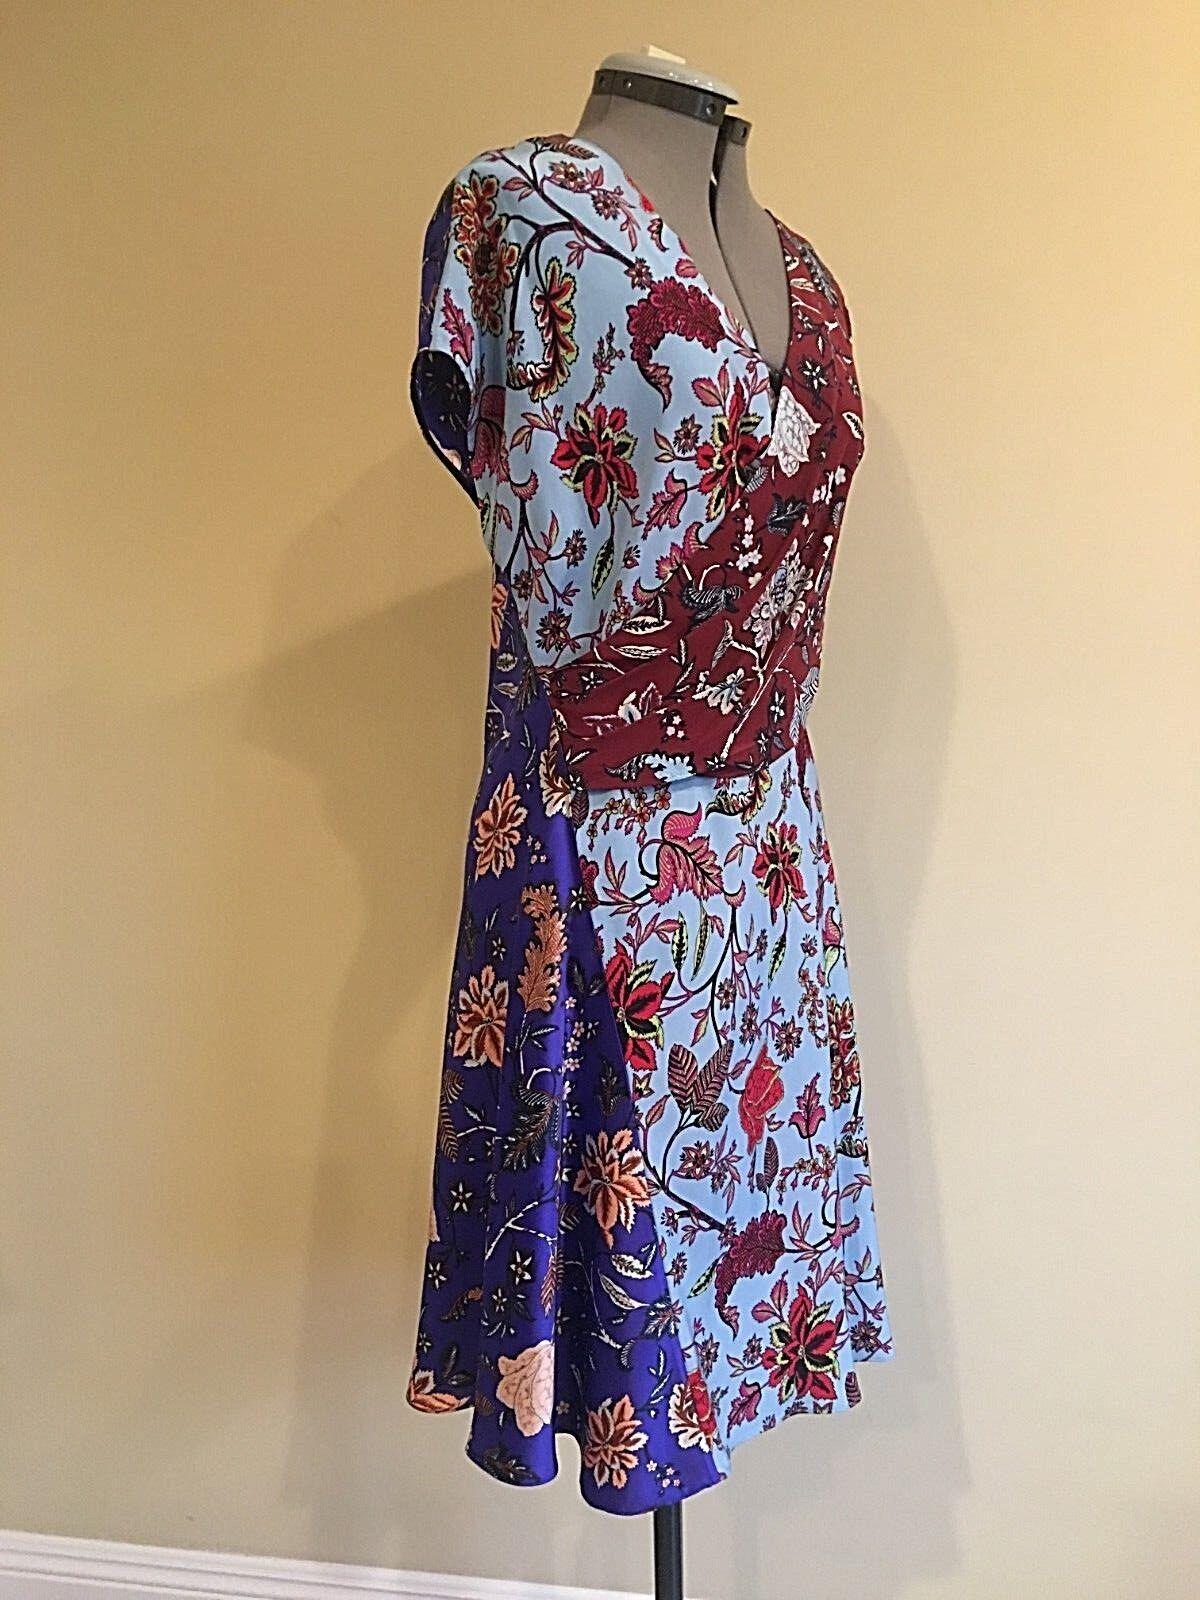 NWT Diane von Furstenberg Floral Wrap Wrap Wrap Front Dress in bluee Multi Size 6 4b04f1